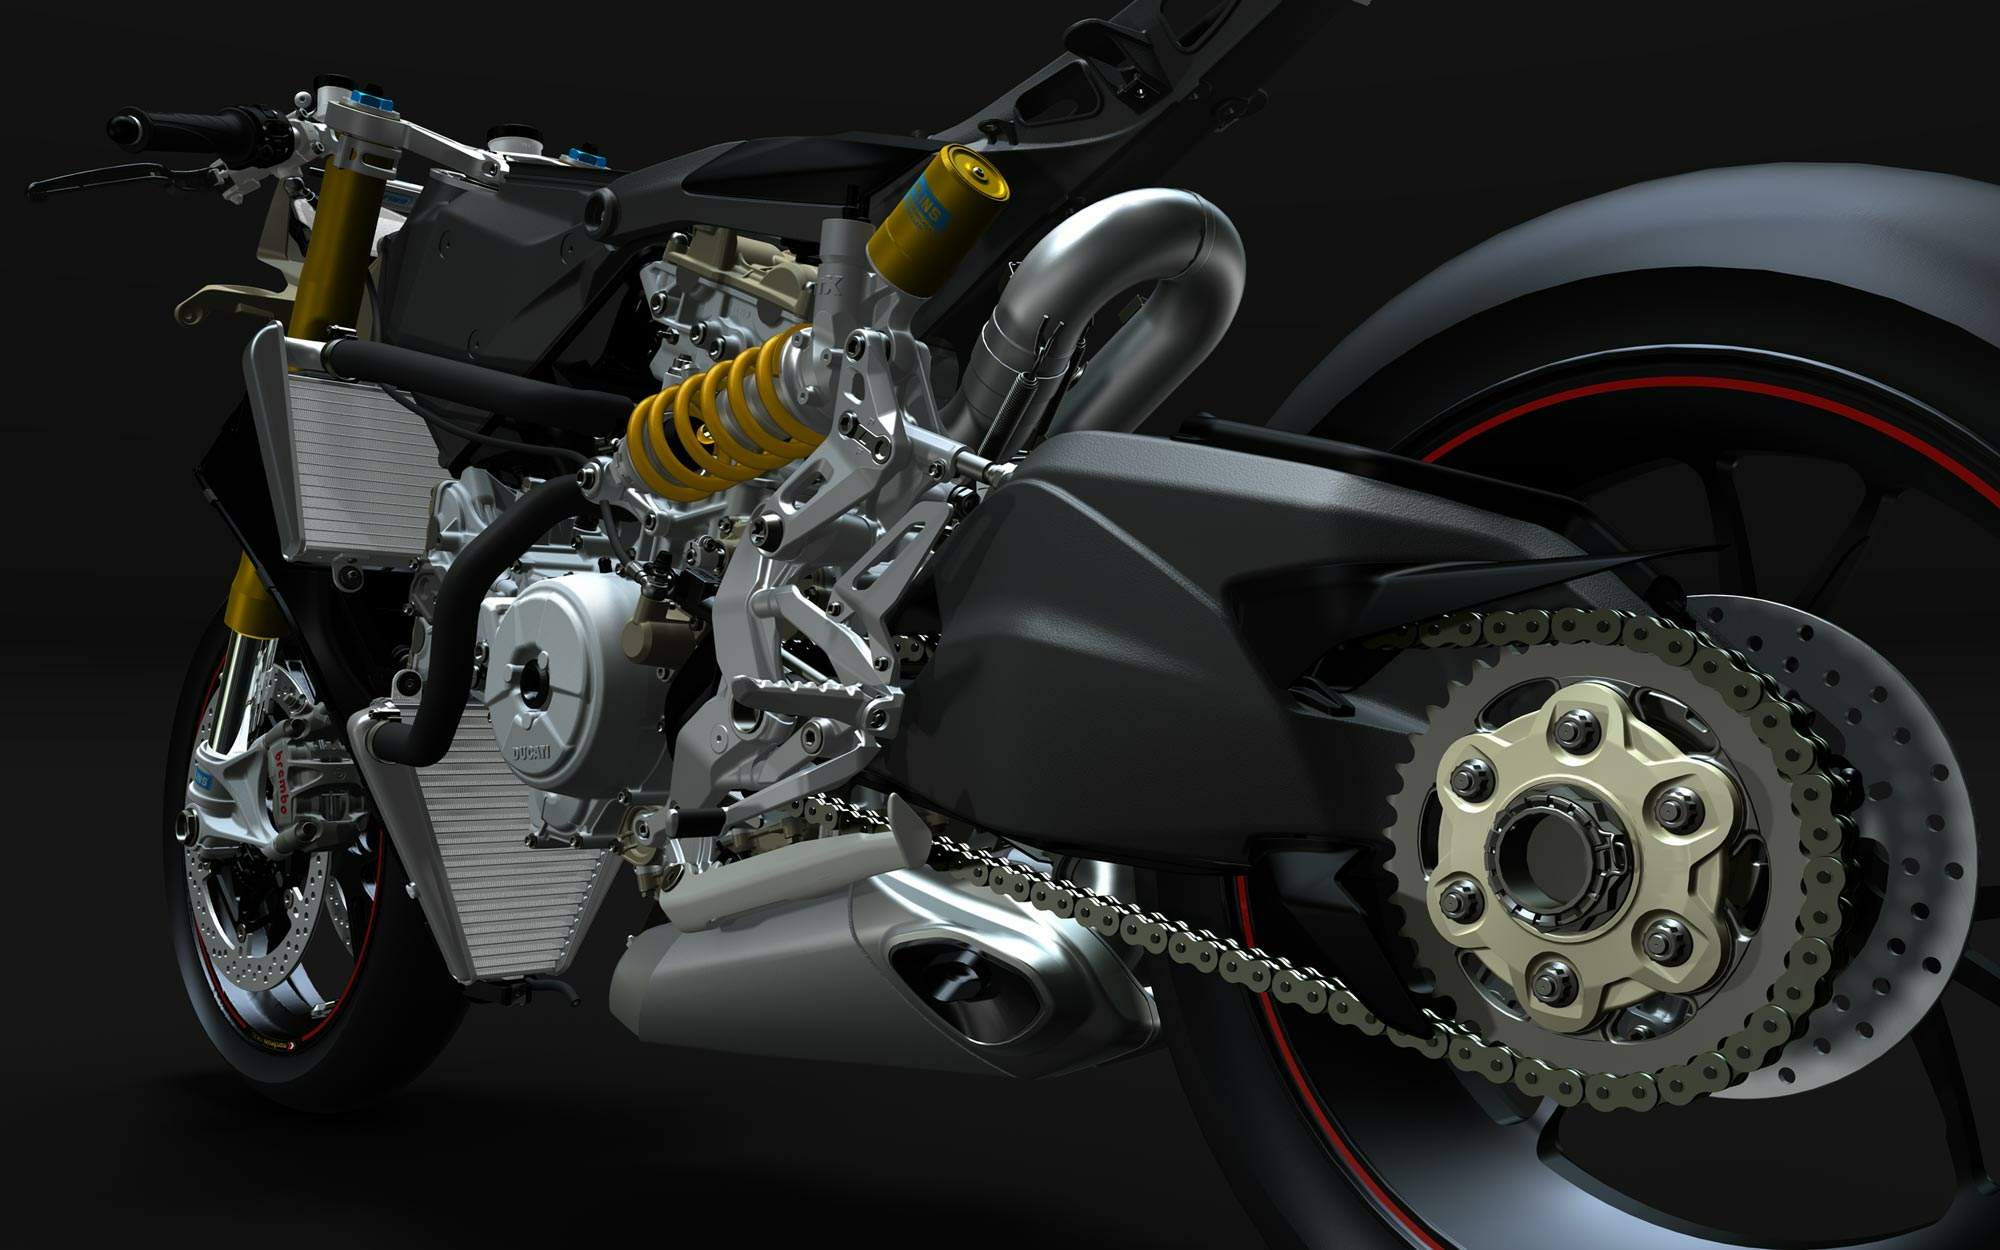 New Colors for Ducati 1199 Panigale - autoevolution